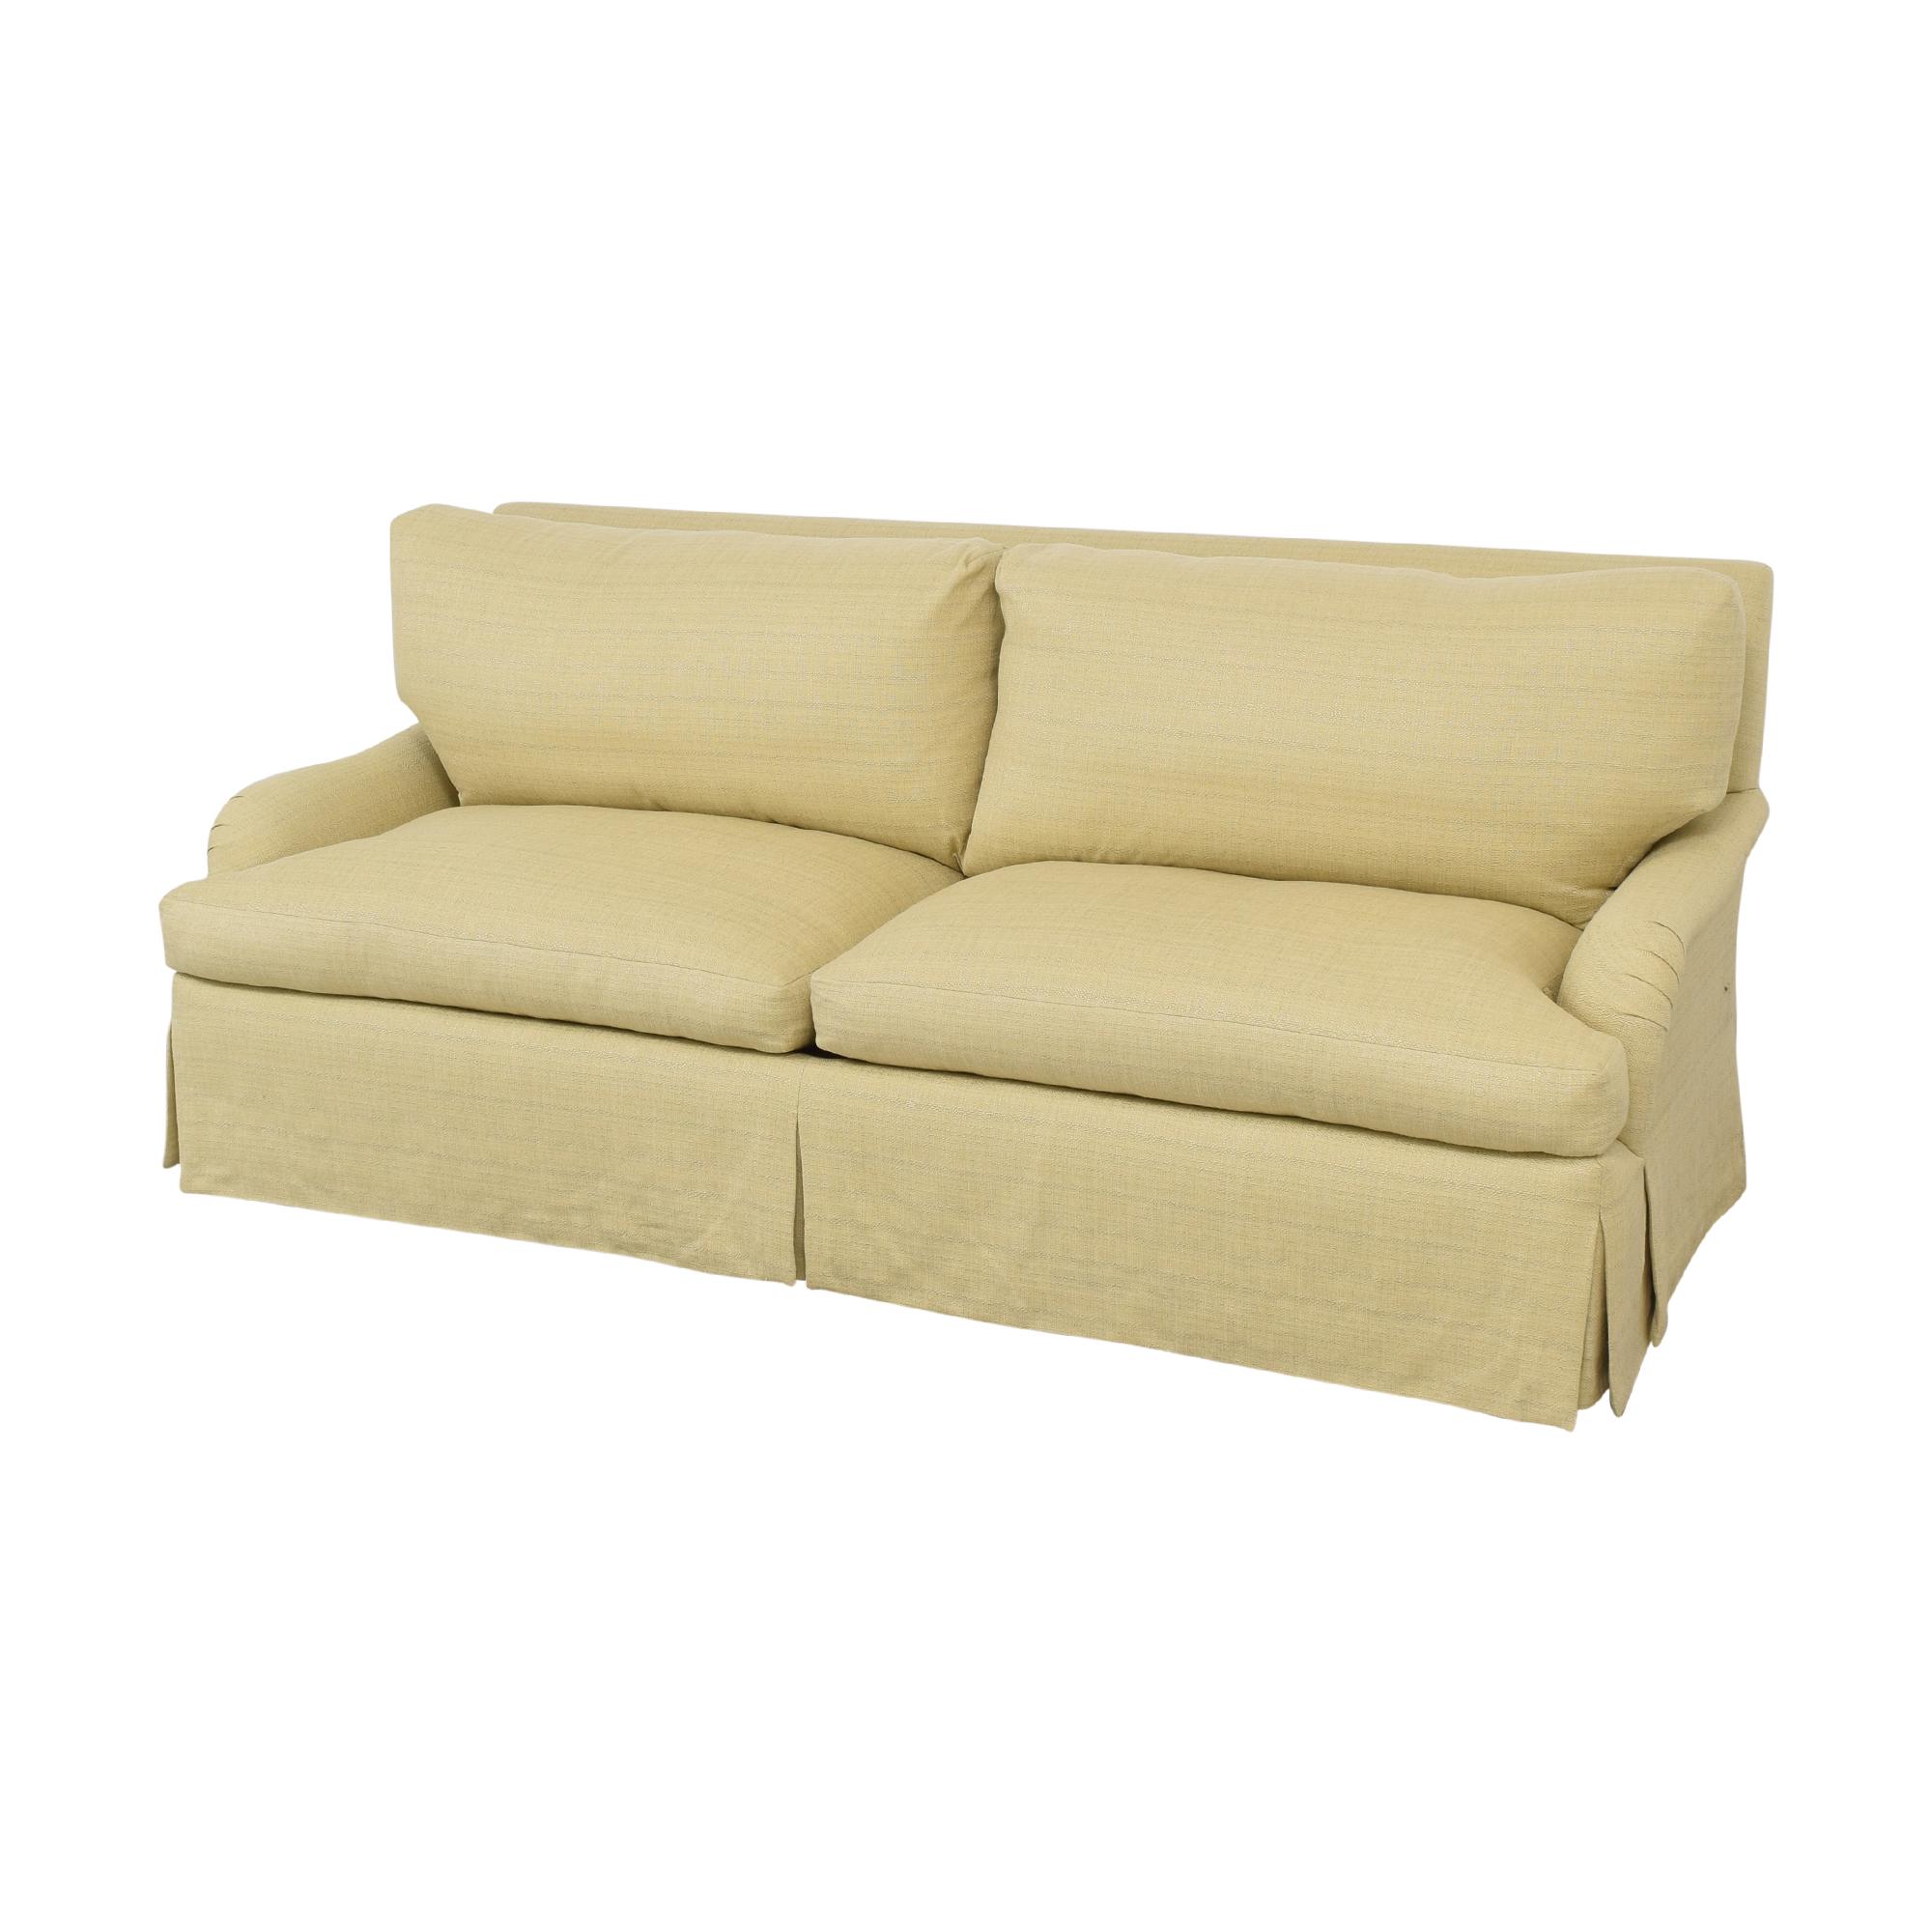 Custom Down Sofa Sofas